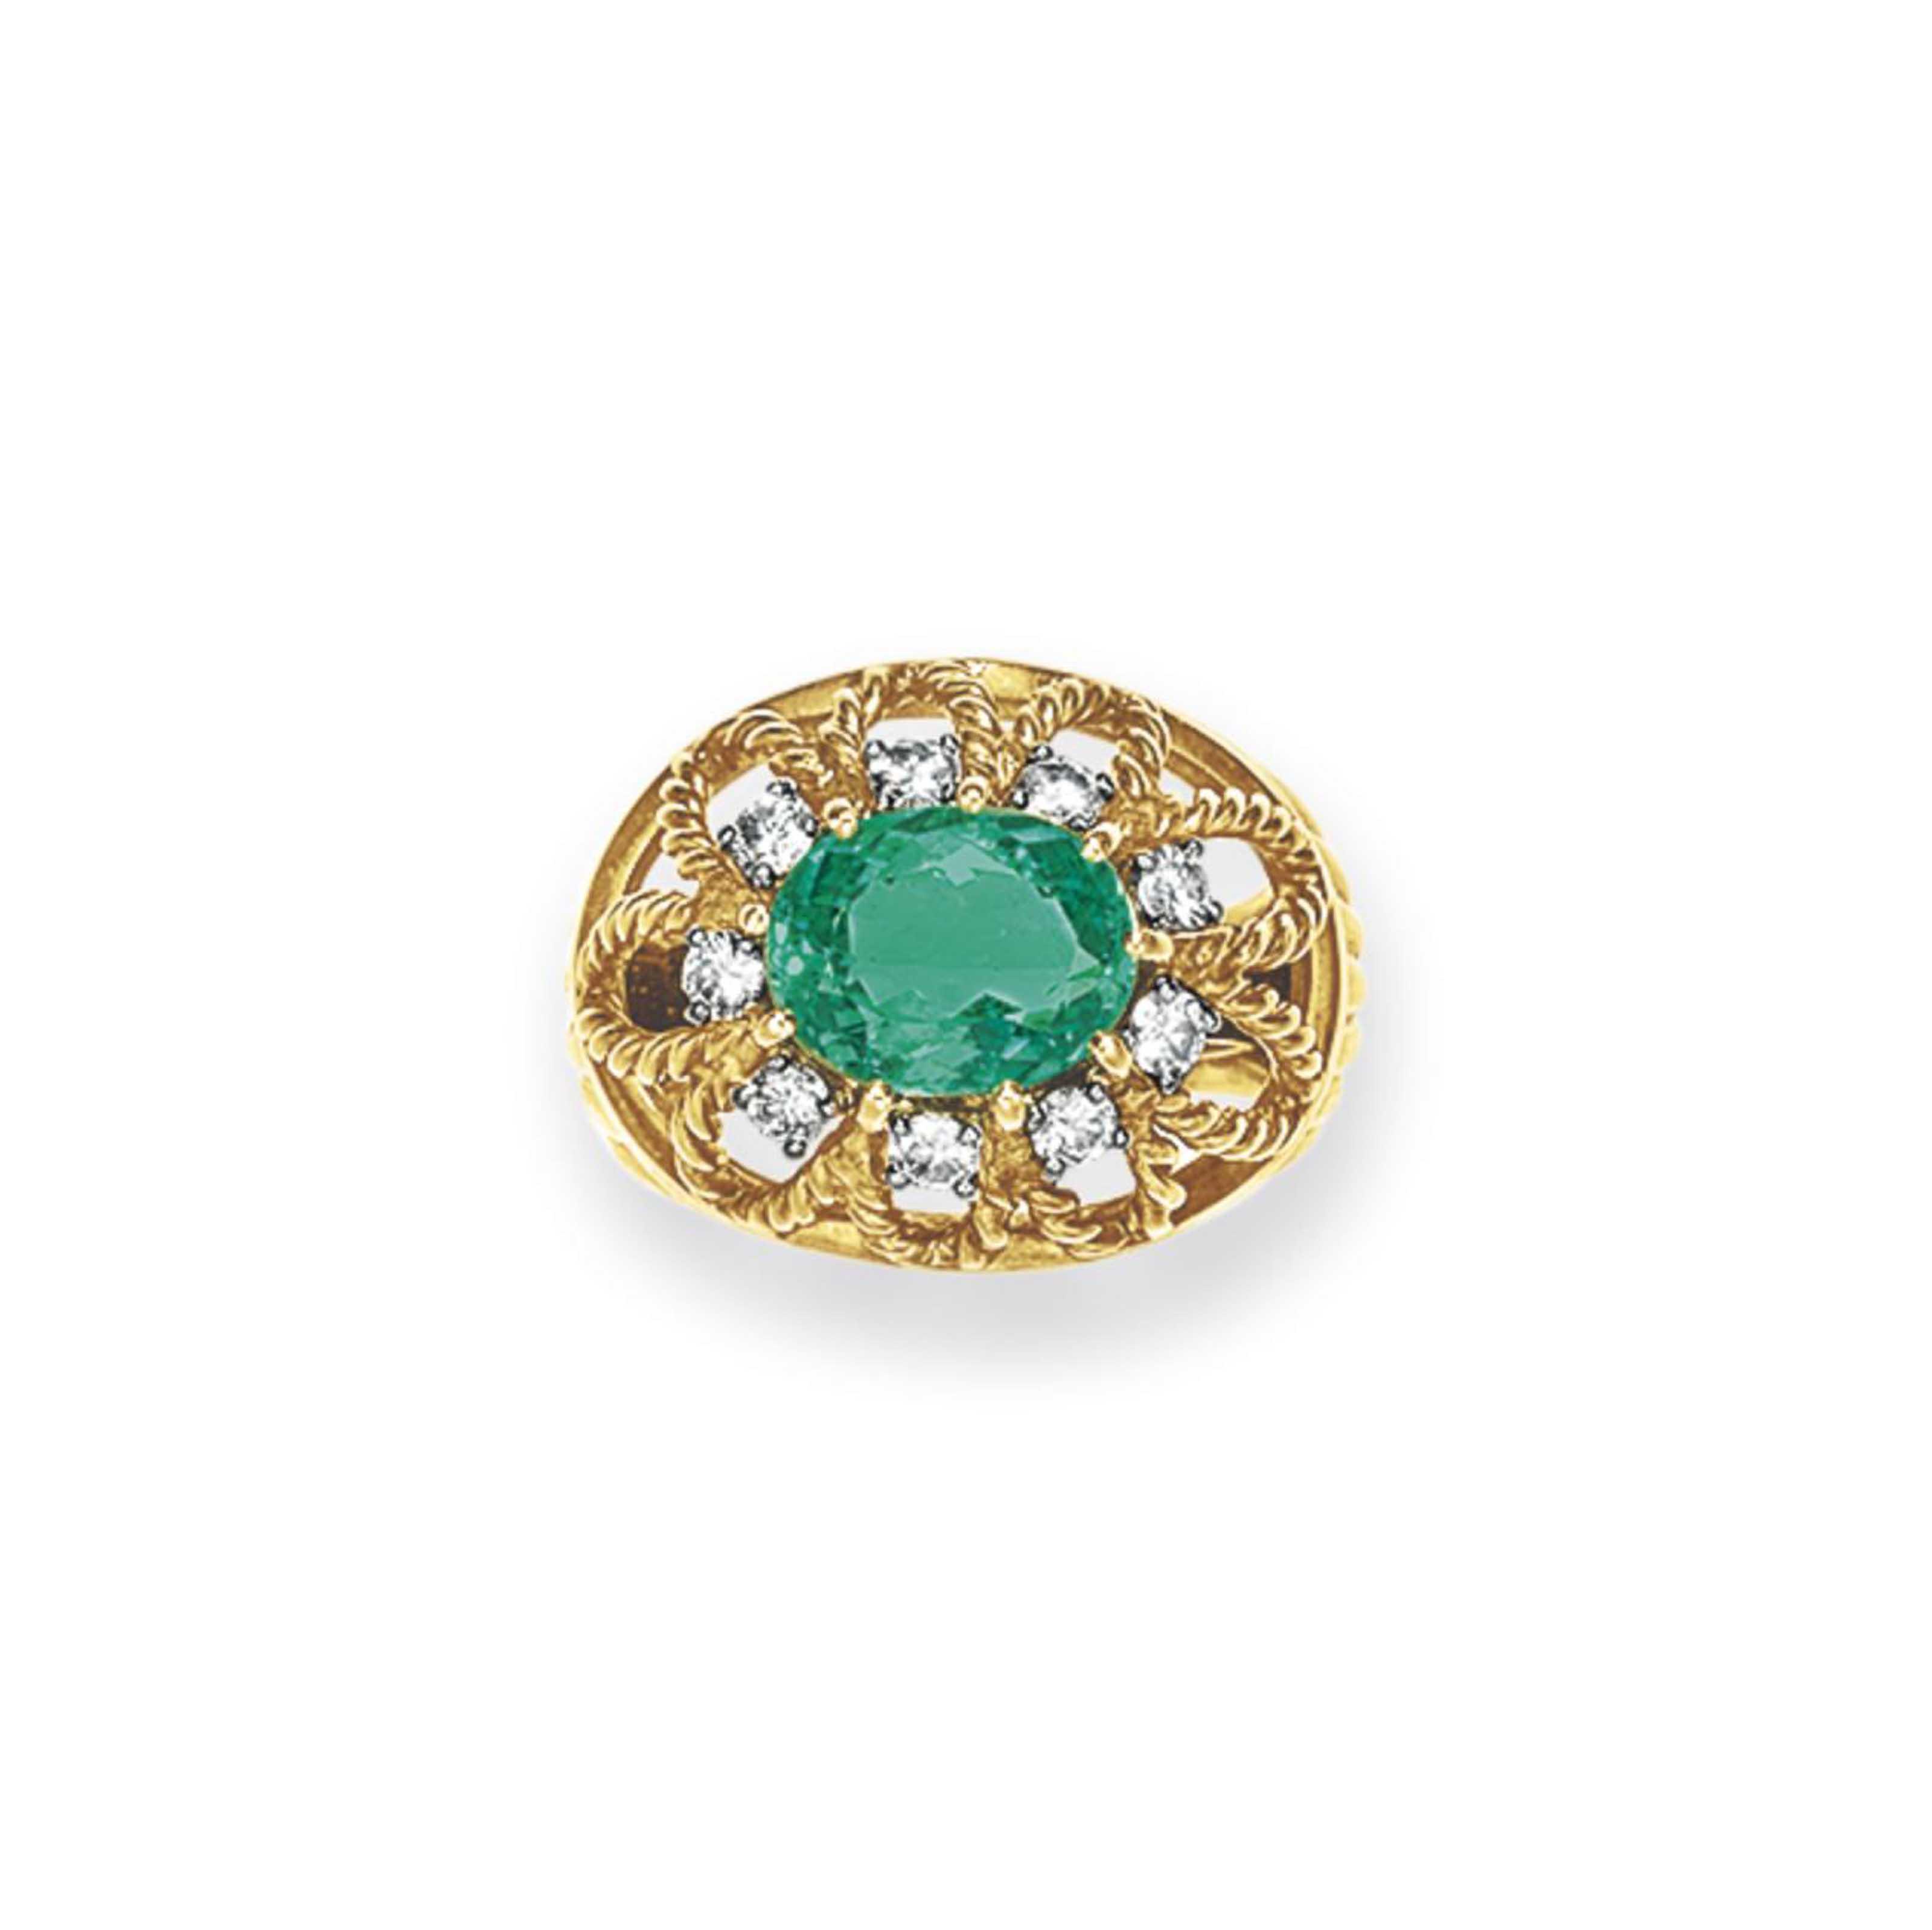 Diamond Ring Yard Sale